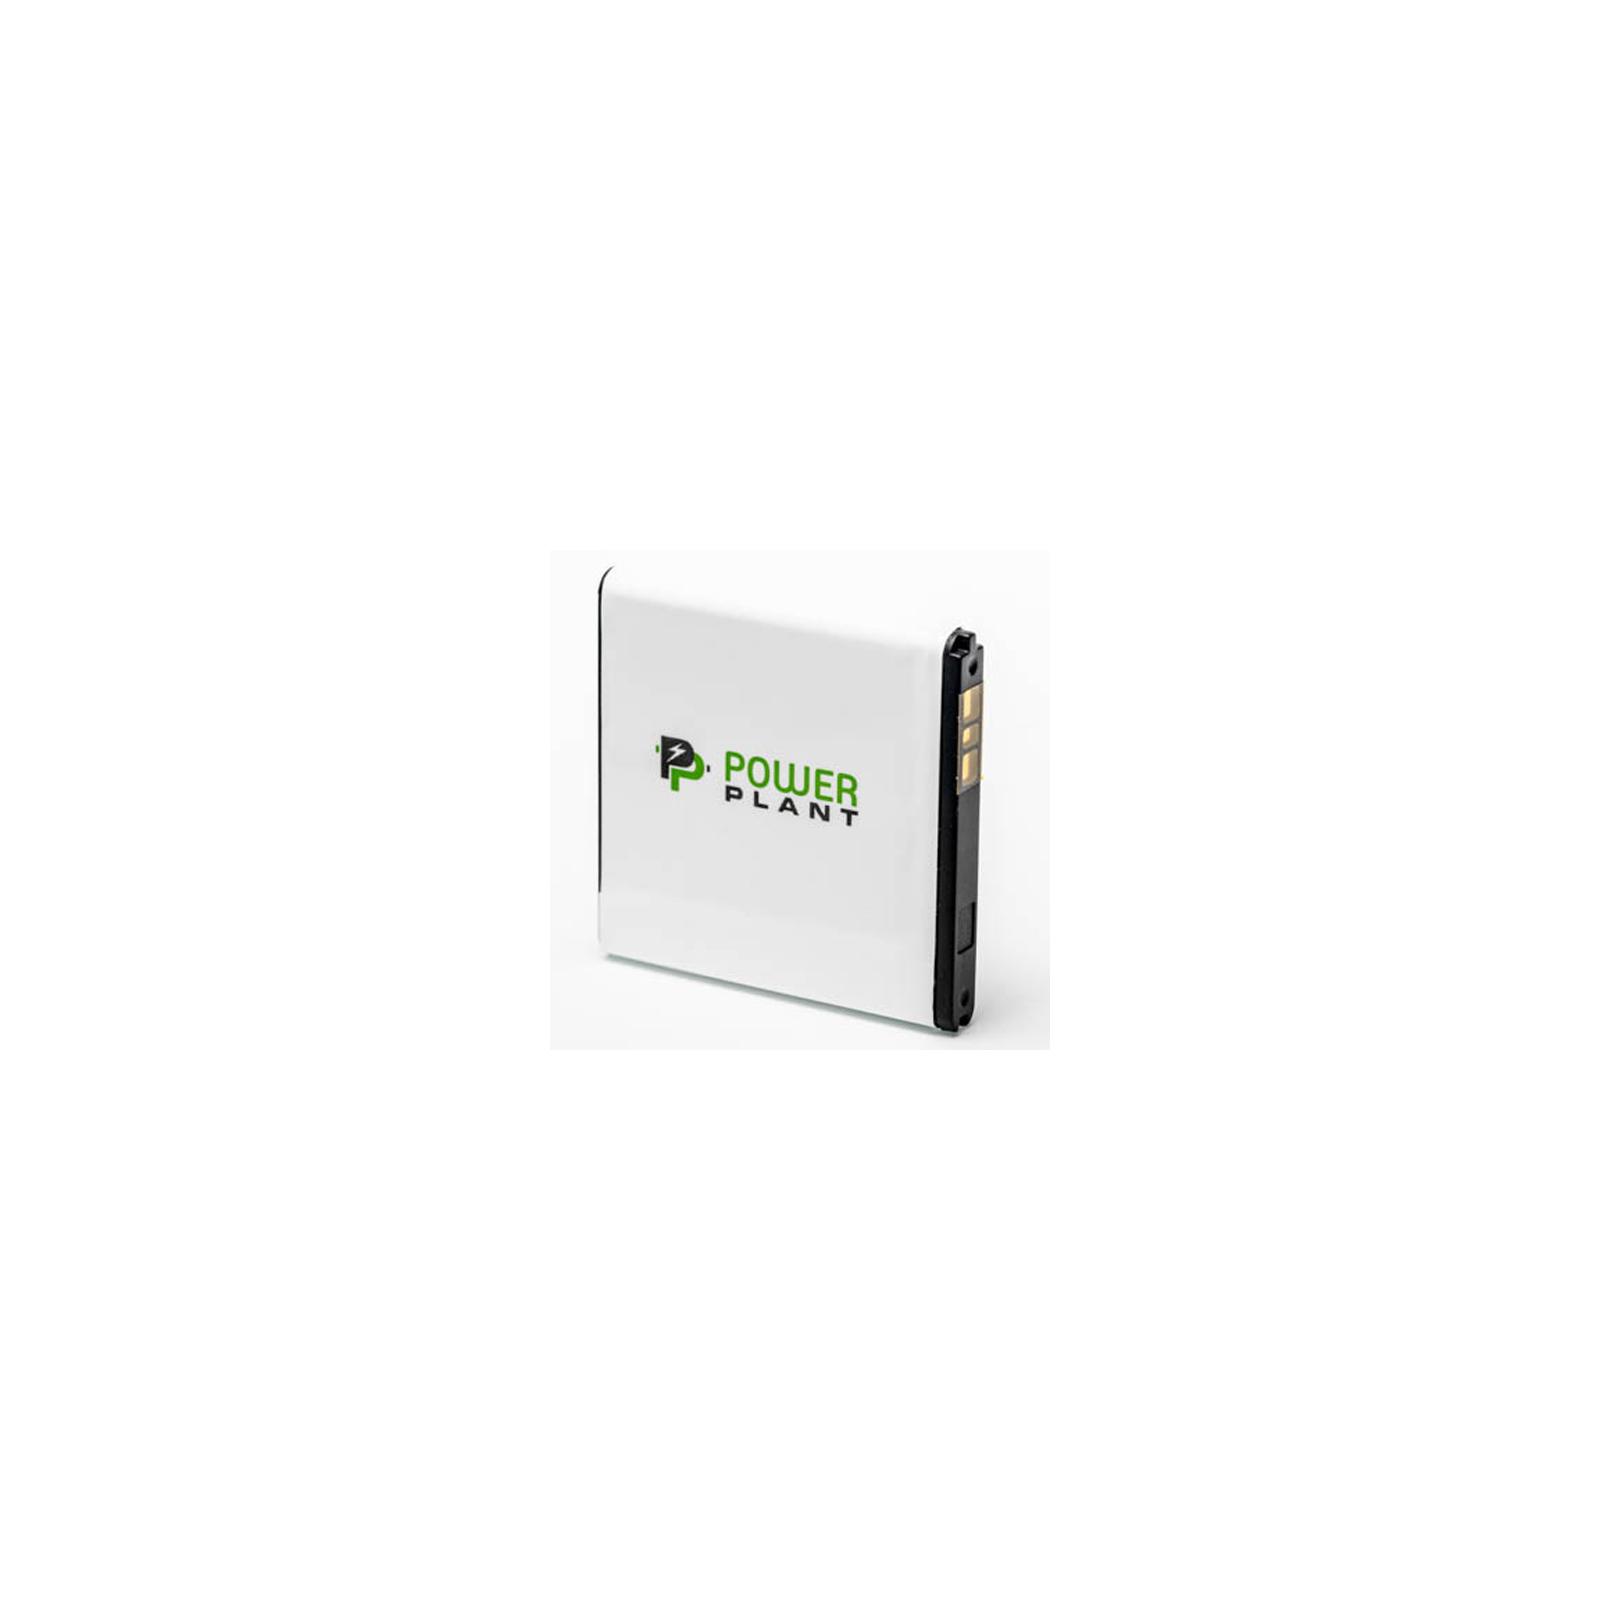 Аккумуляторная батарея PowerPlant Sony Ericsson BA700 (Xperia Pro) (DV00DV6105) изображение 2